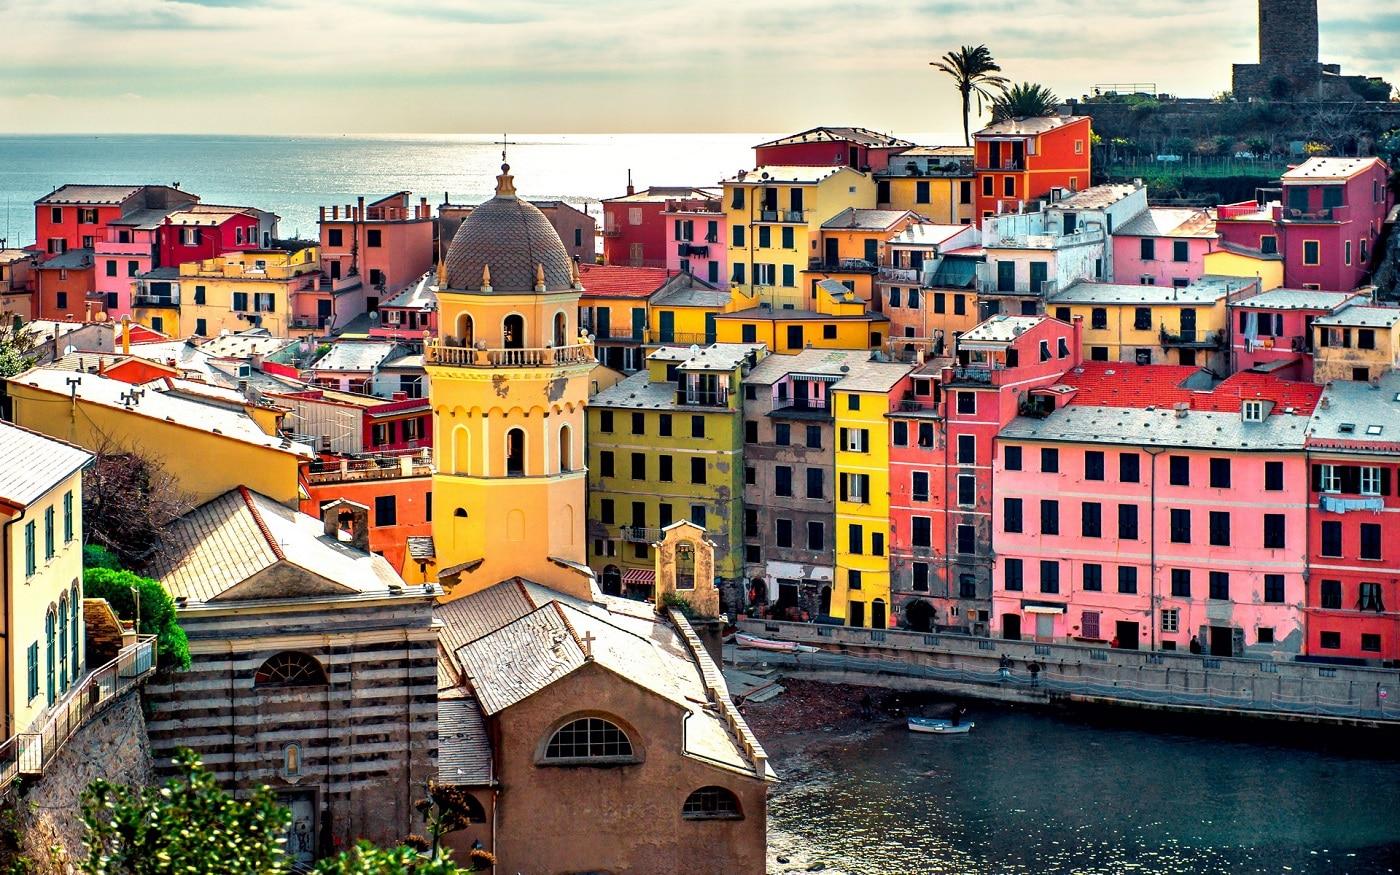 Vernazza, un oraș plin de culoare!